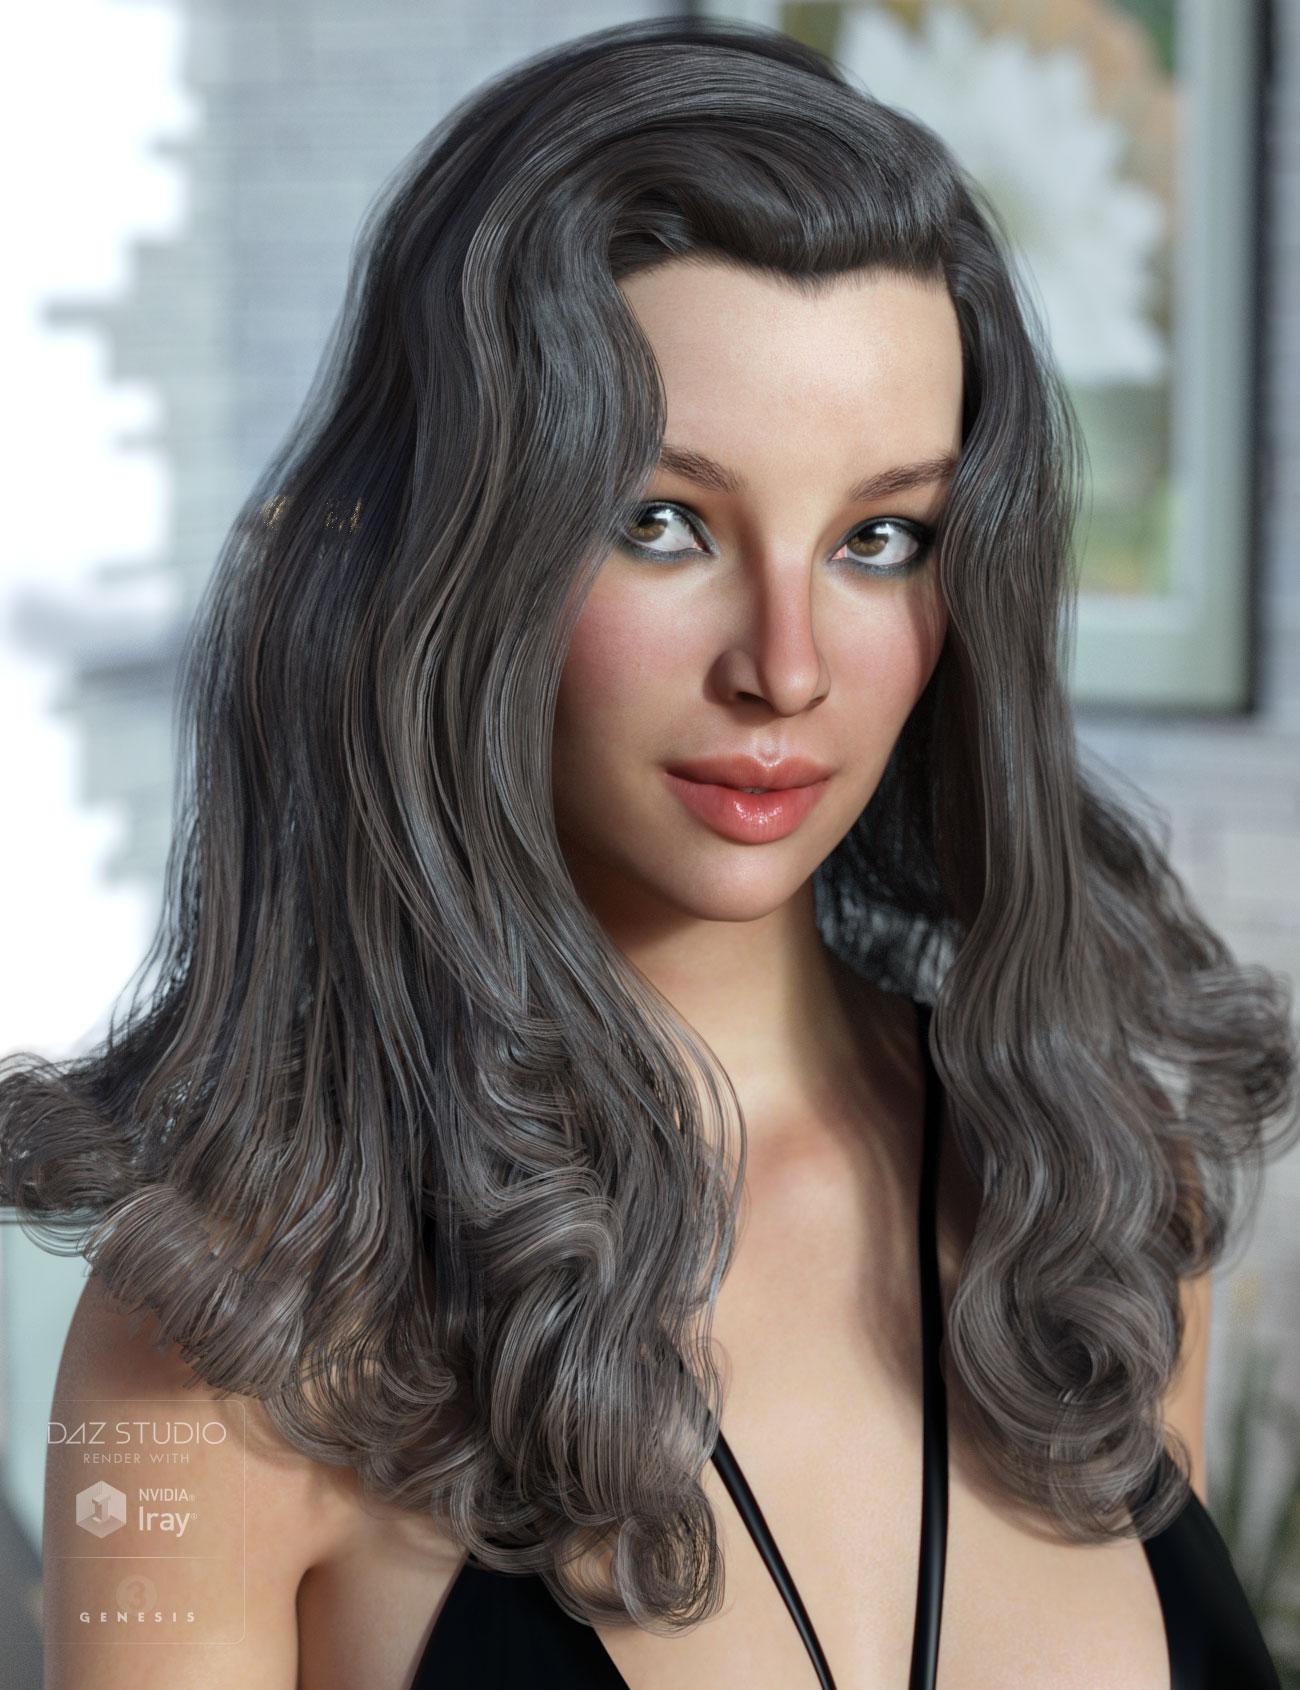 Fane Hair for Genesis 3 Female(s) by: AprilYSH, 3D Models by Daz 3D